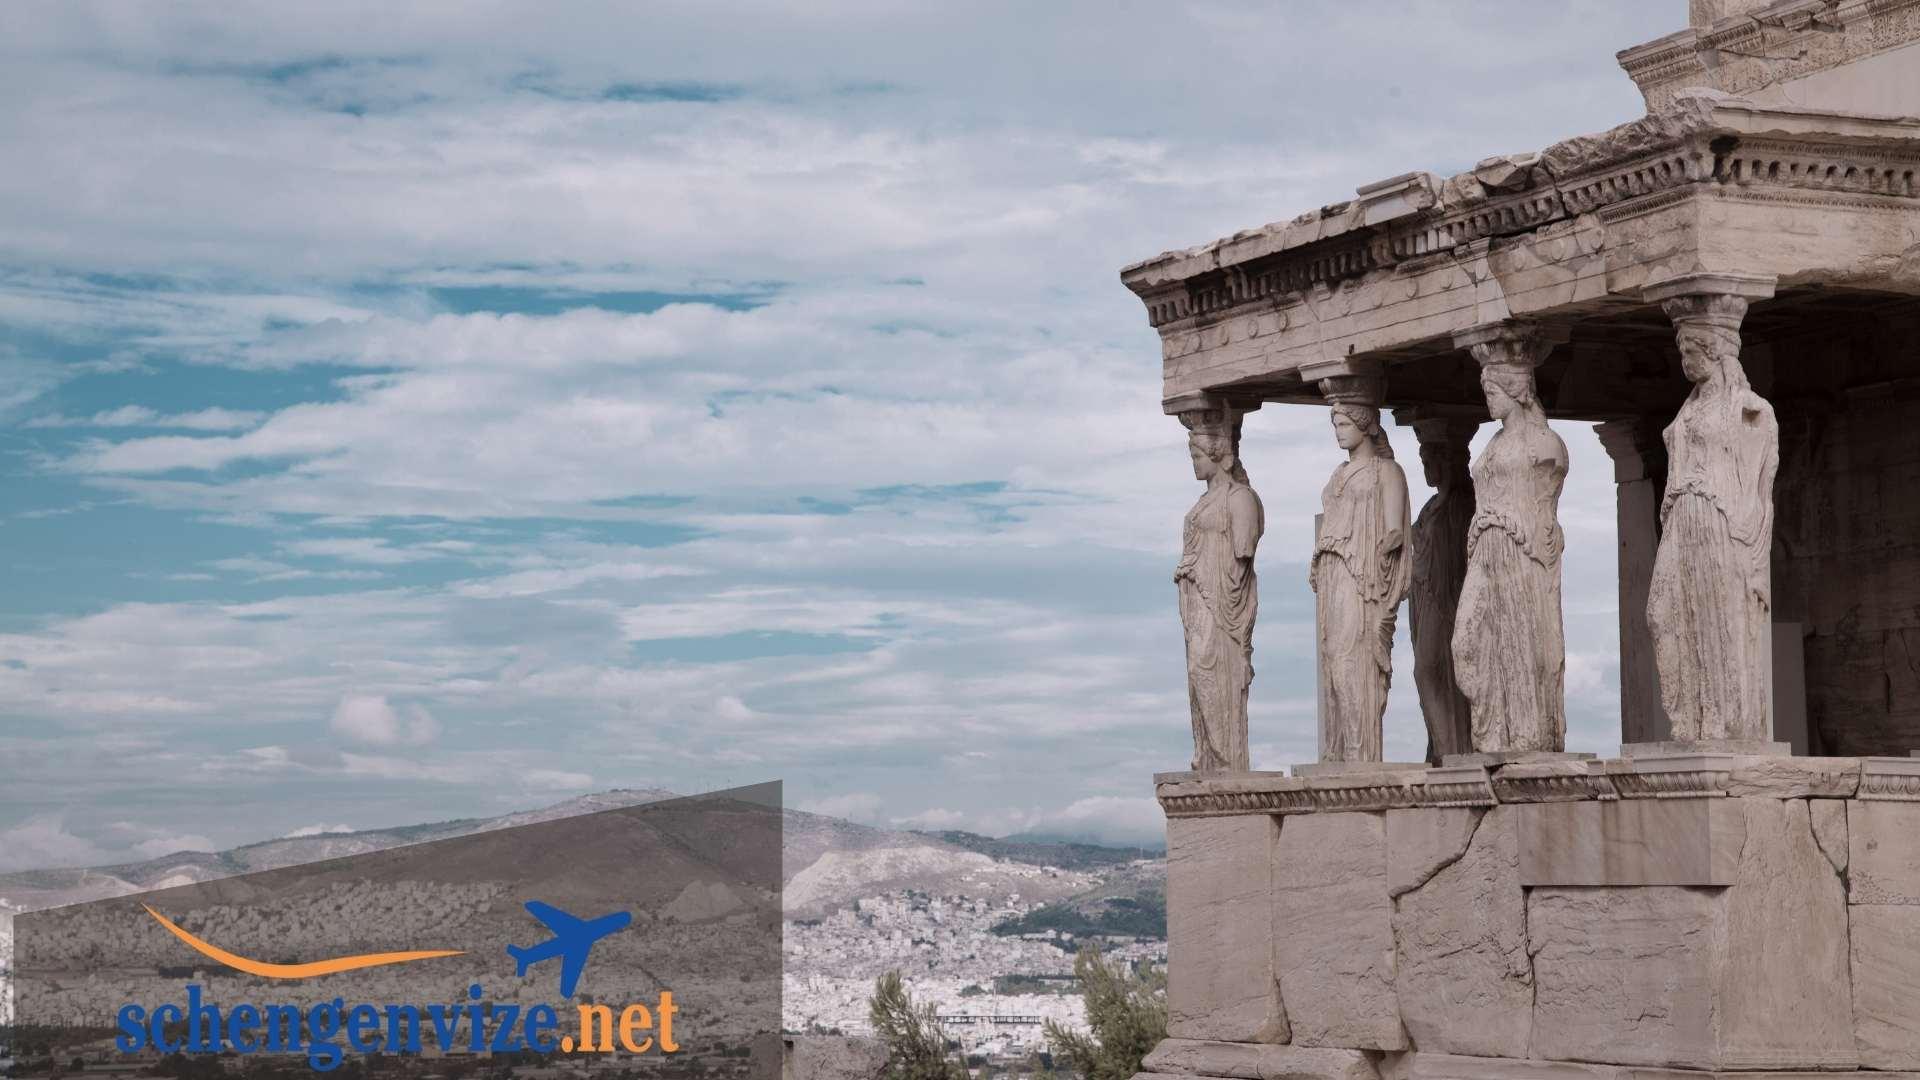 Yunanistan Turistik Vize Gerekli Evraklar